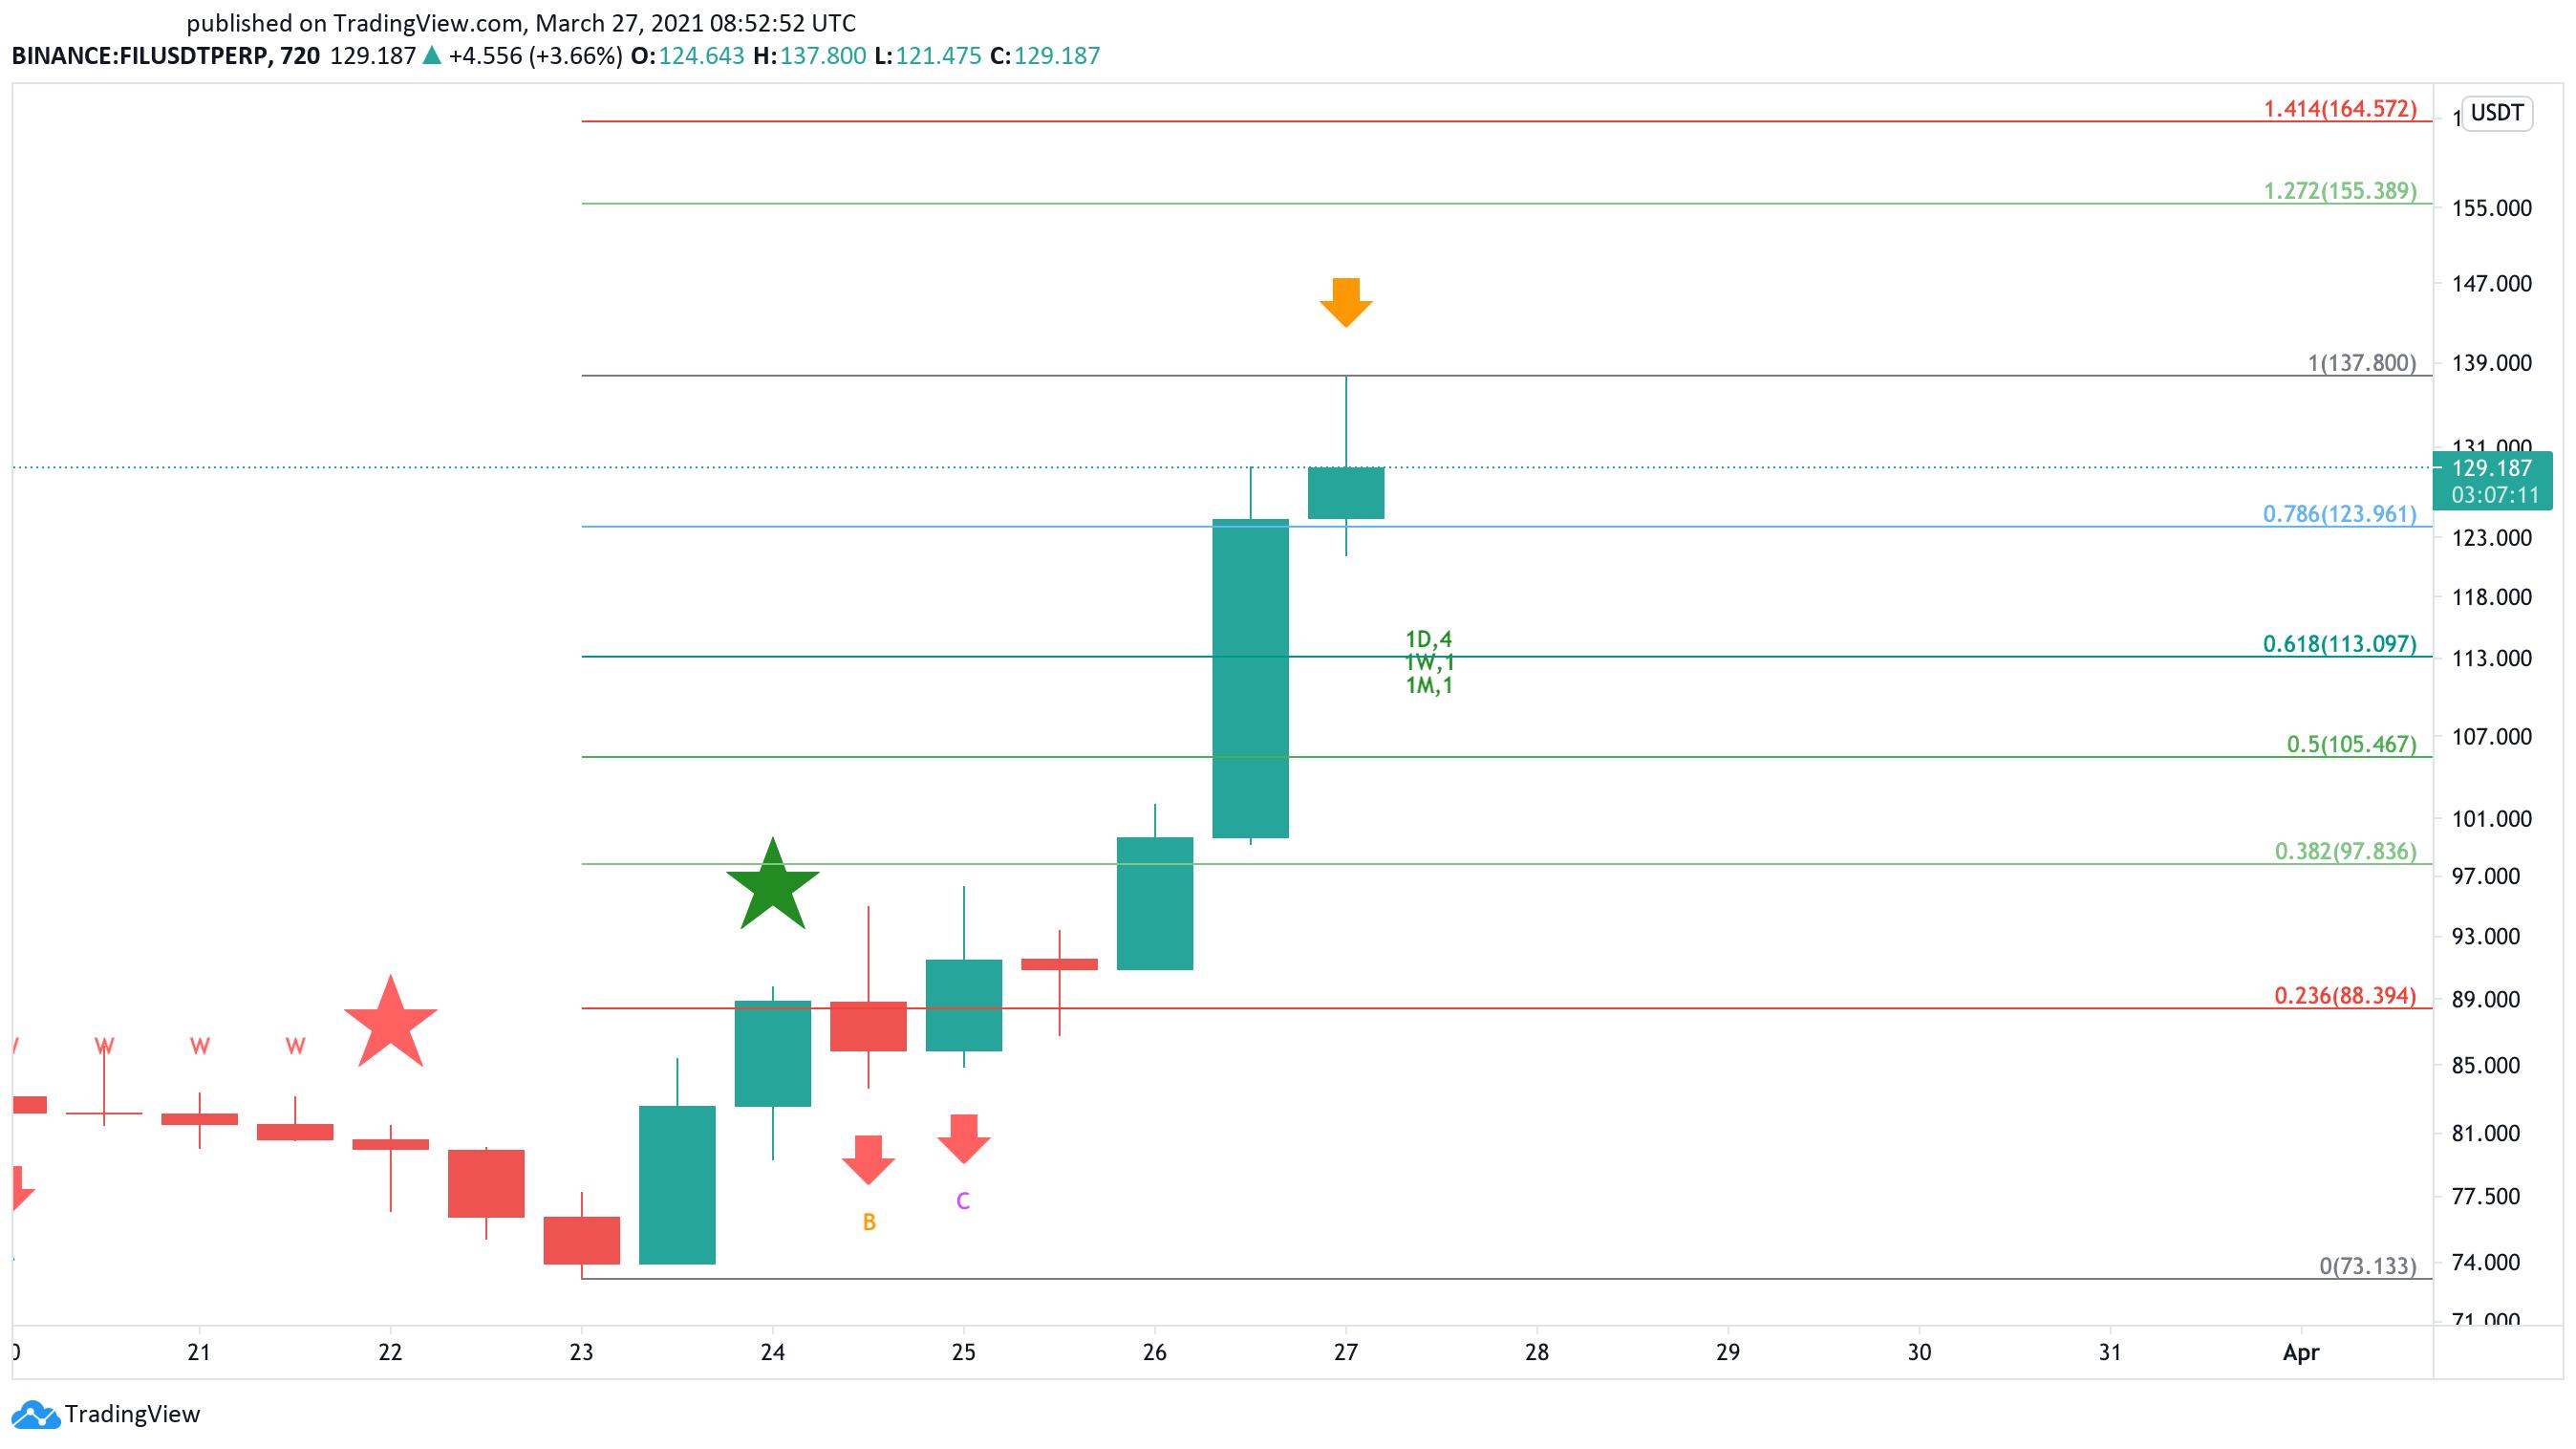 Filecoin US dollar price chart